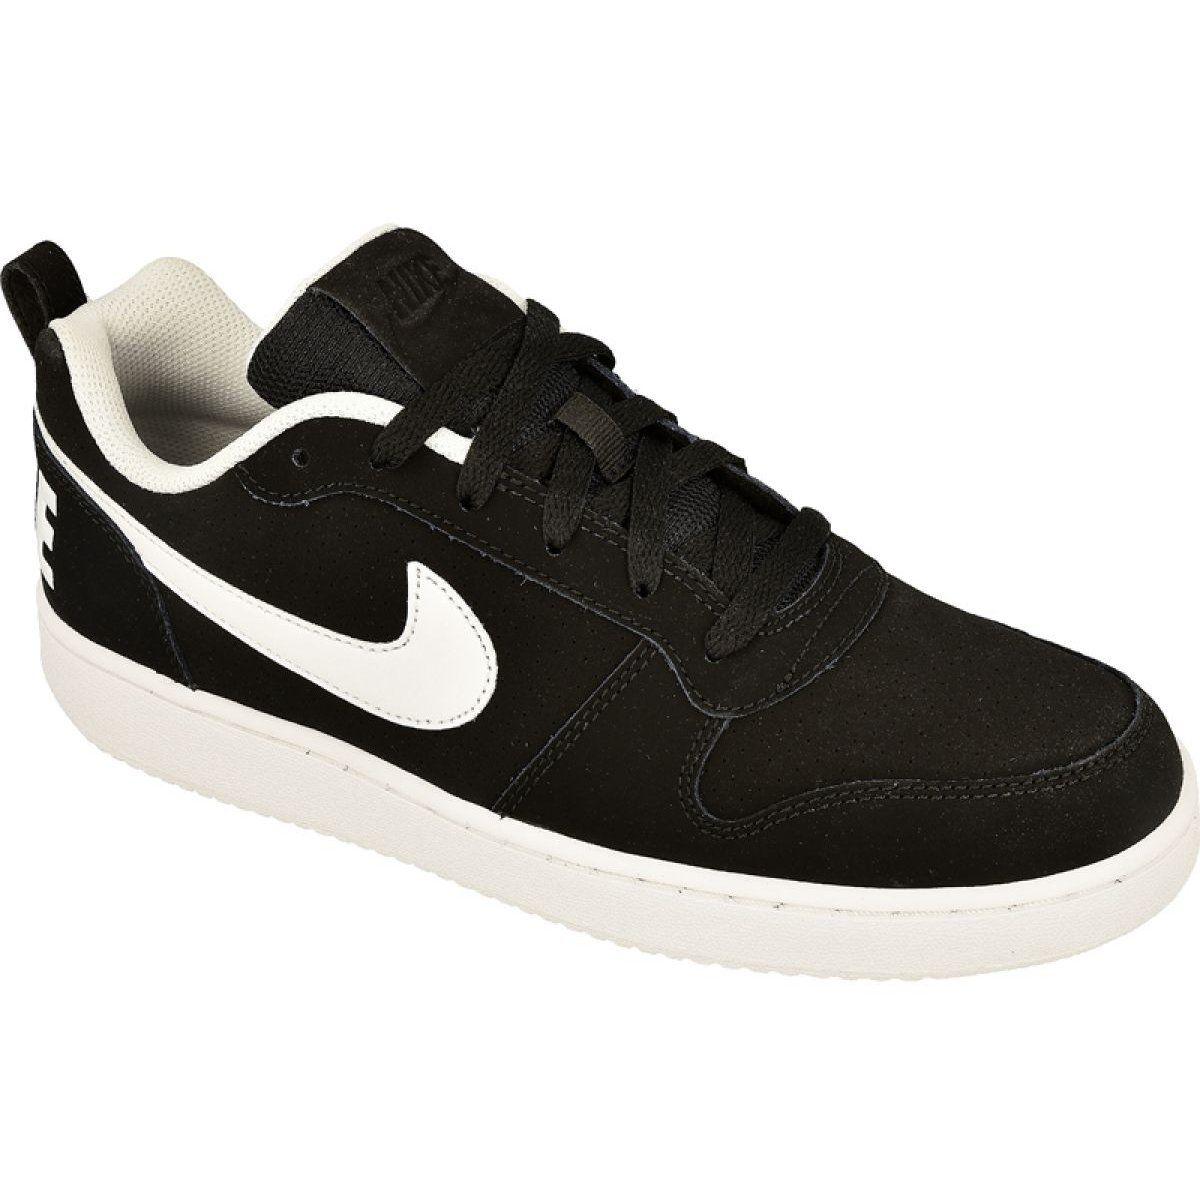 Buty Nike Sportswear Court Borough Low M 838937 010 Czarne Nike Sportswear Mens Nike Shoes Nike